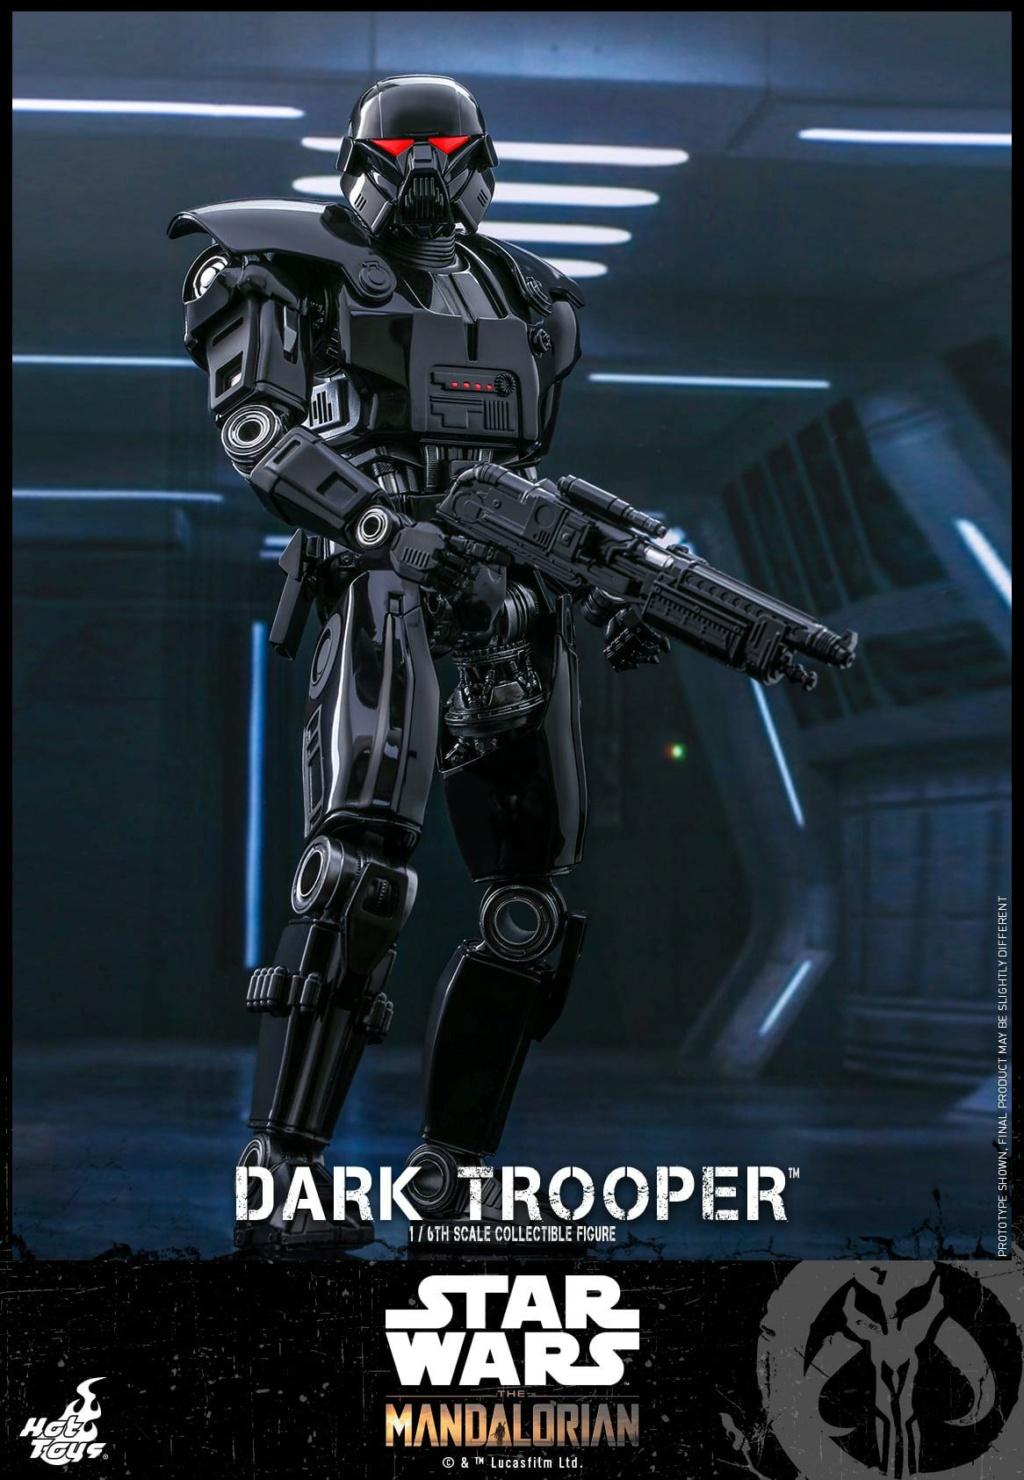 Dark Trooper Collectible Figure - 1/6th scale - Hot Toys Dark_t12